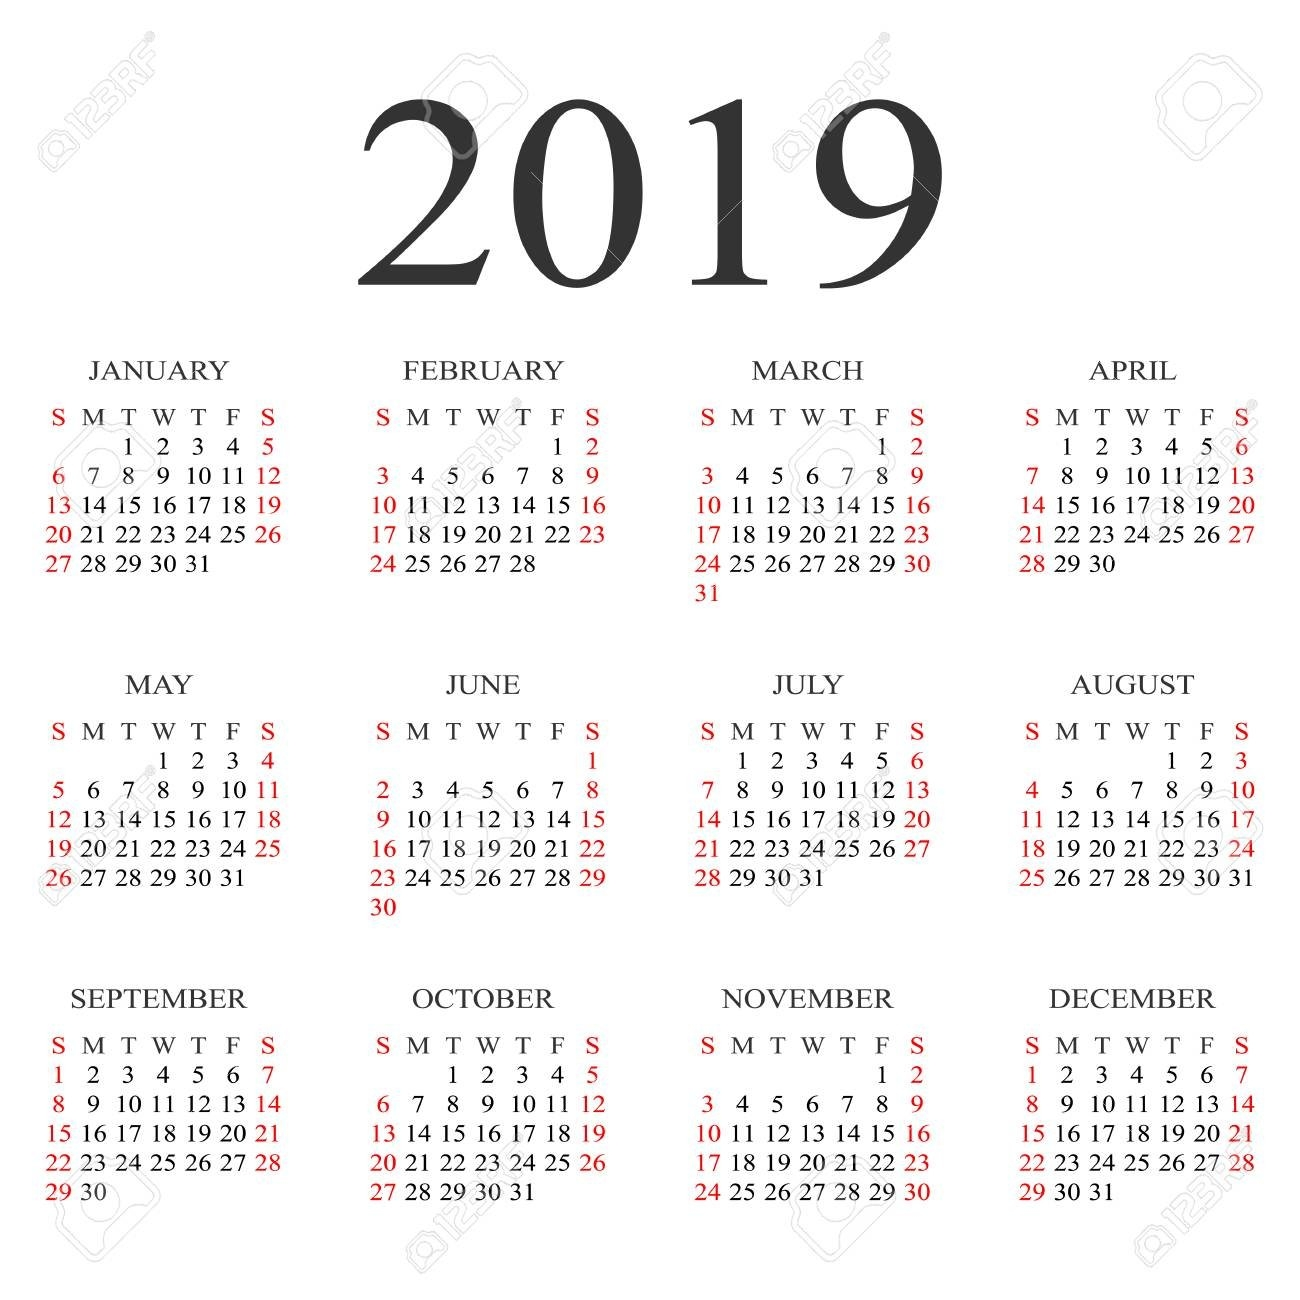 Calendar 2019 Year Vector Design Template. Simple 2019 Year Calendar Calendar 2019 Year